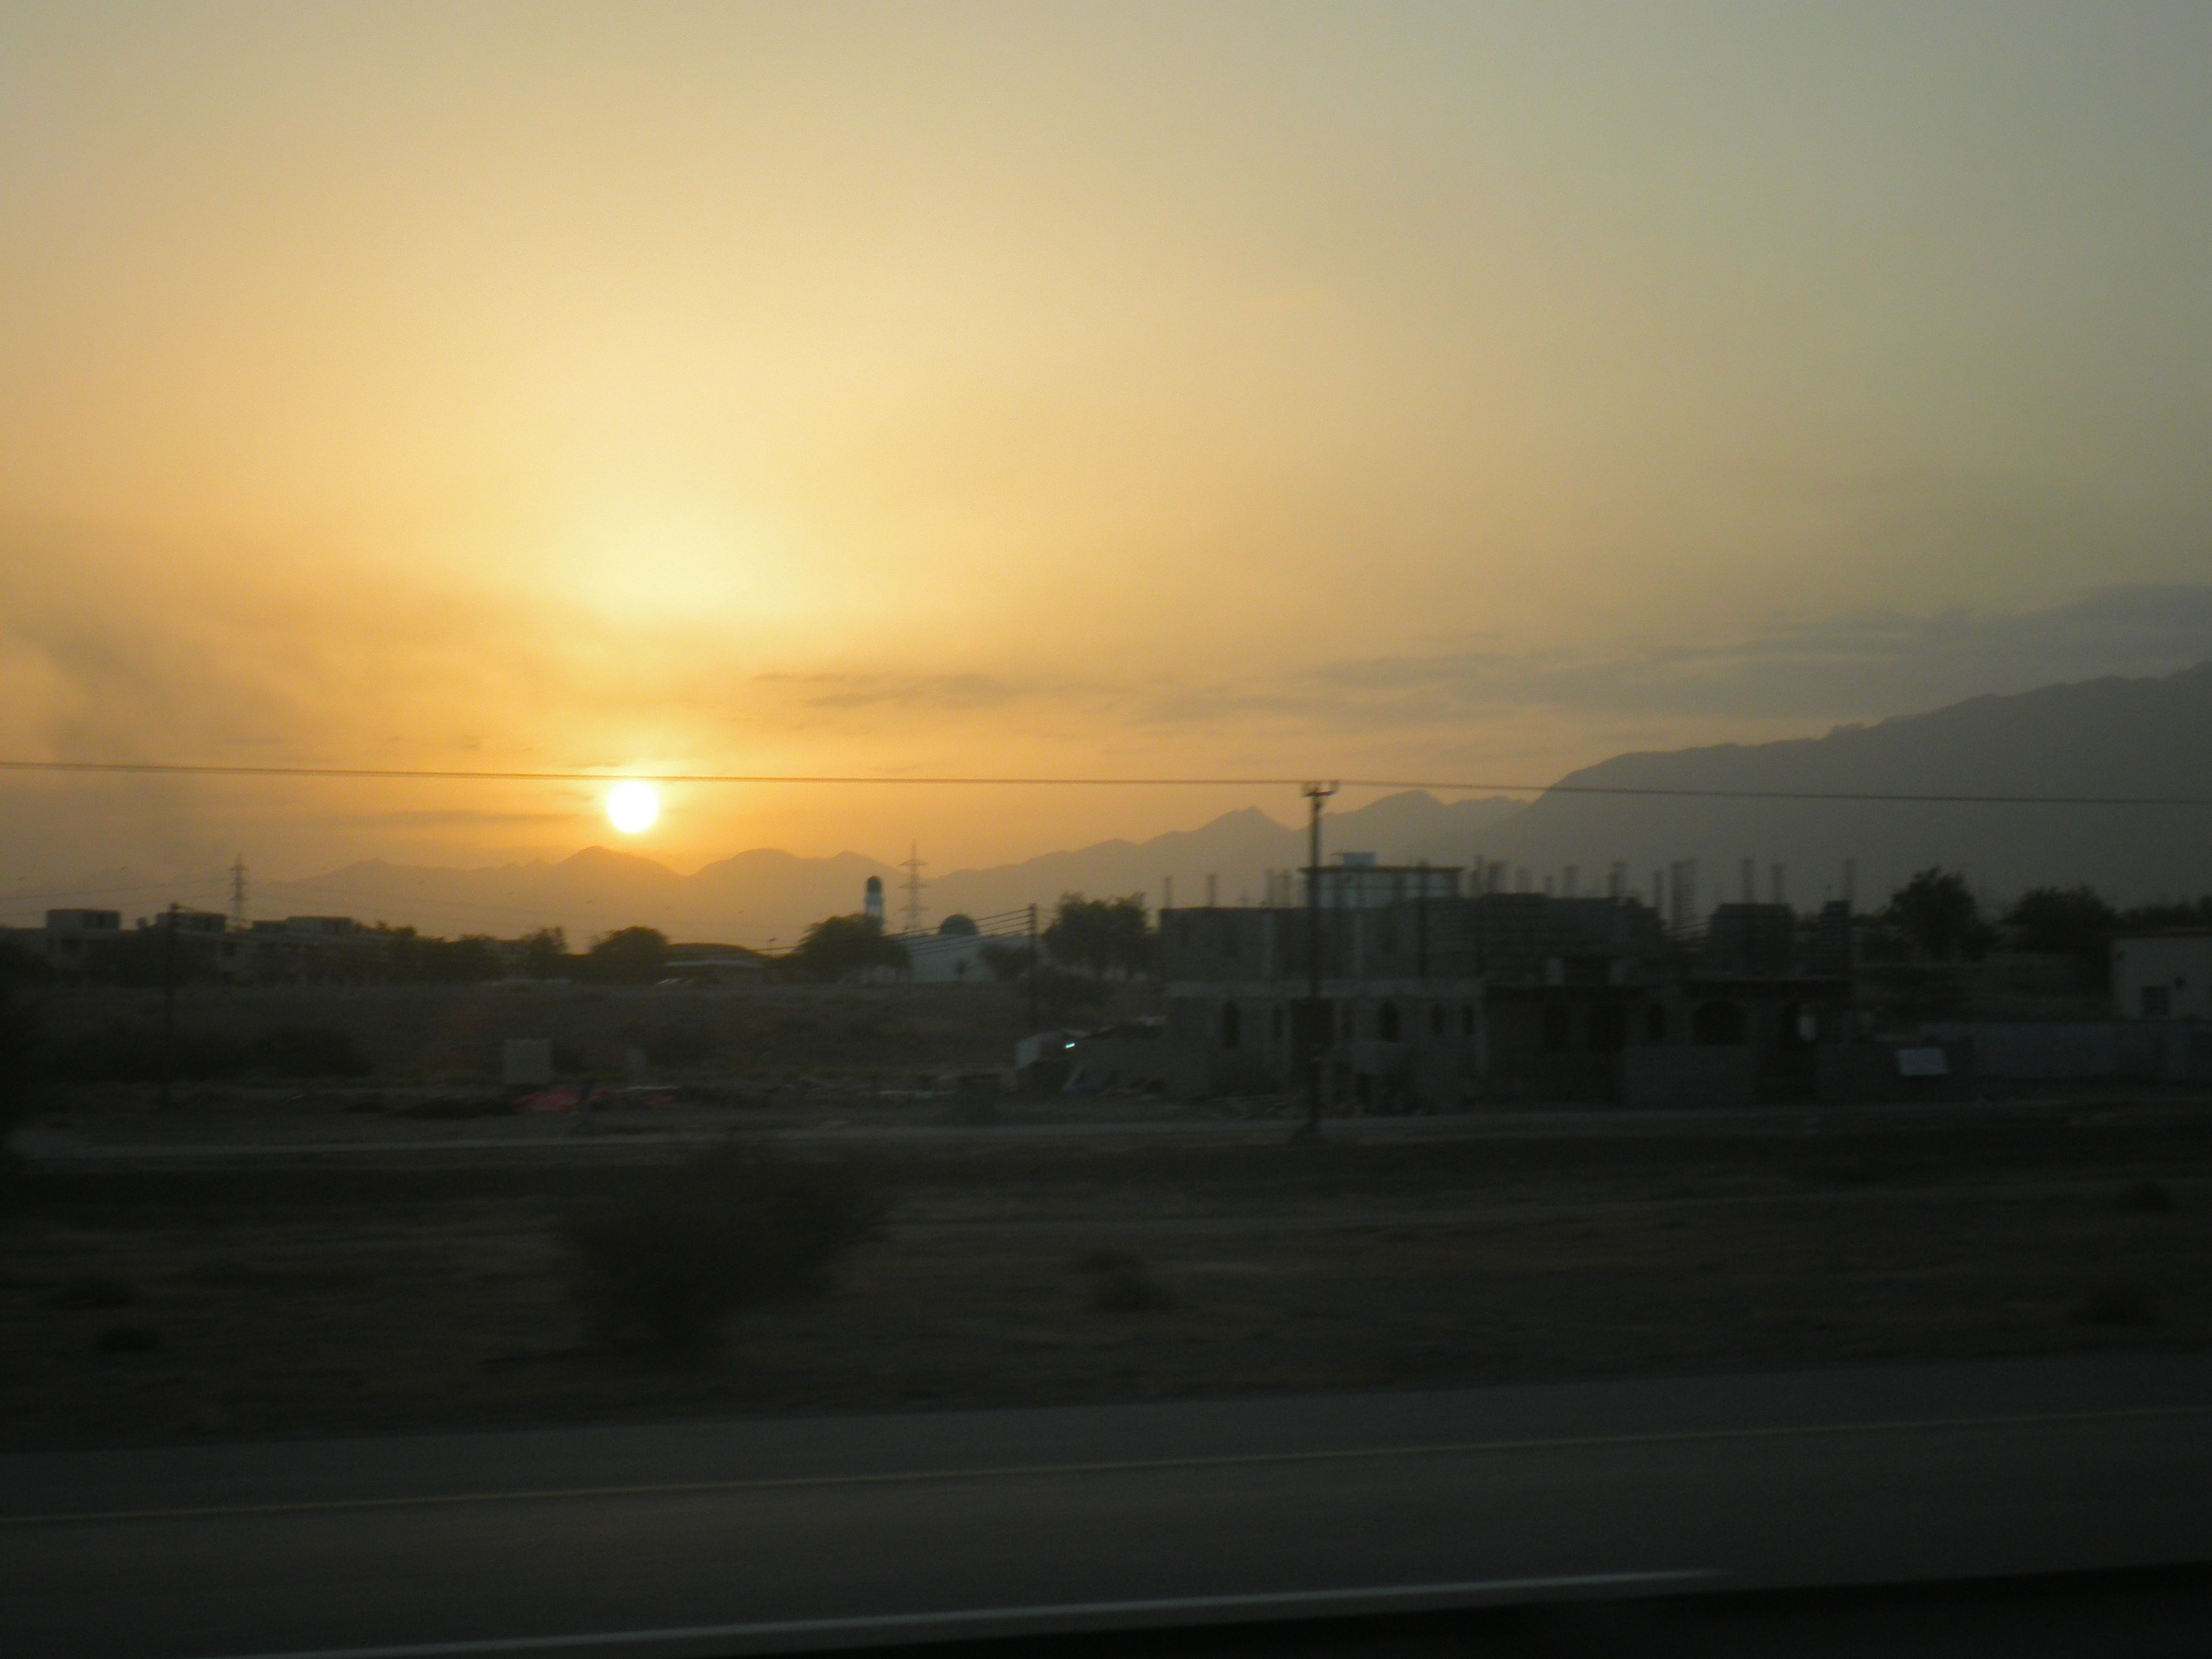 Sunrise in Oman